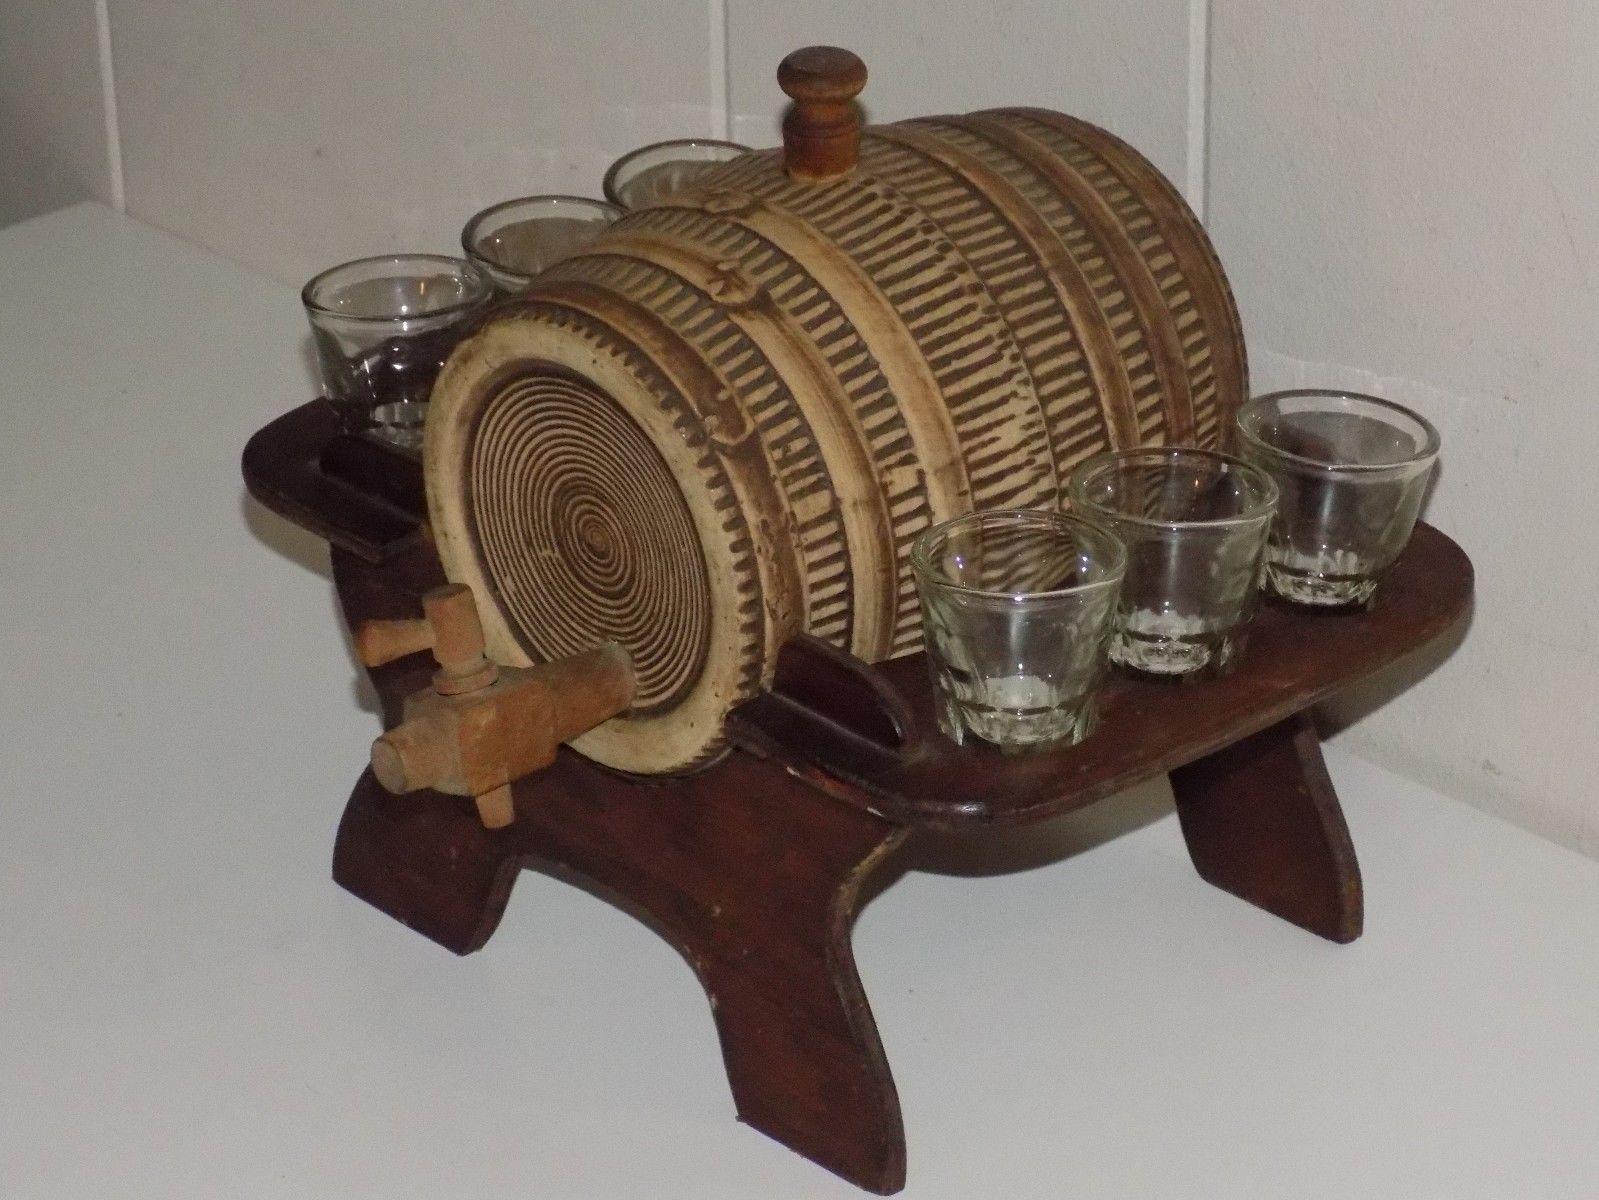 0a6f00df82 Ceramic Keg Whiskey Barrel Wooden Stand 6 Shotglasses